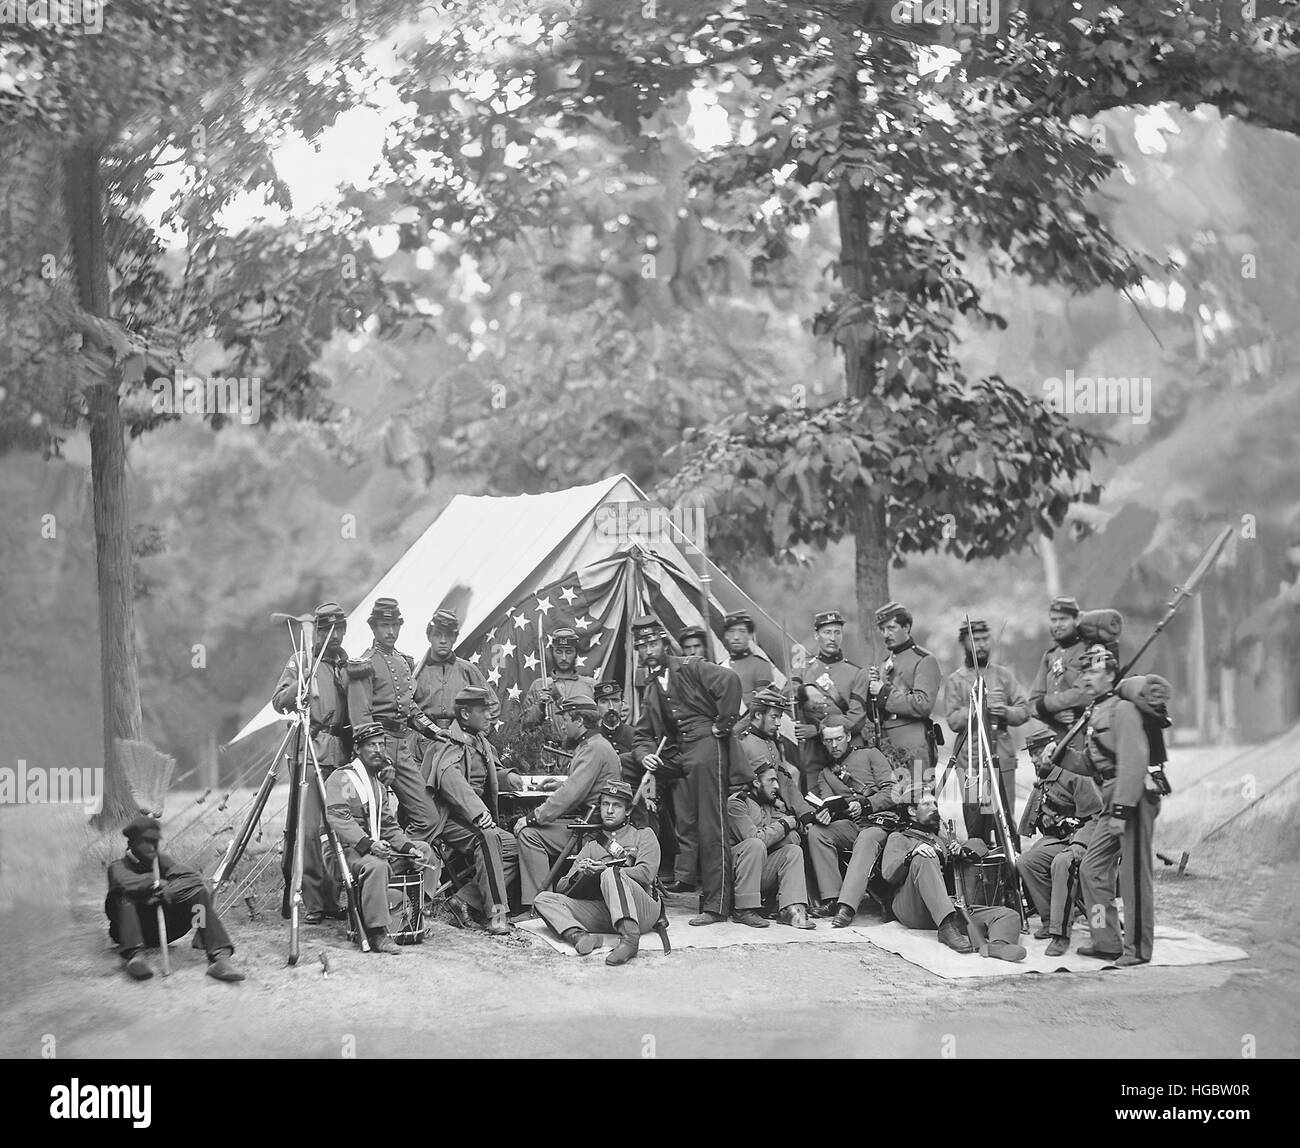 Engineer camp, 8th N.Y. State Militia, American Civil War. - Stock Image